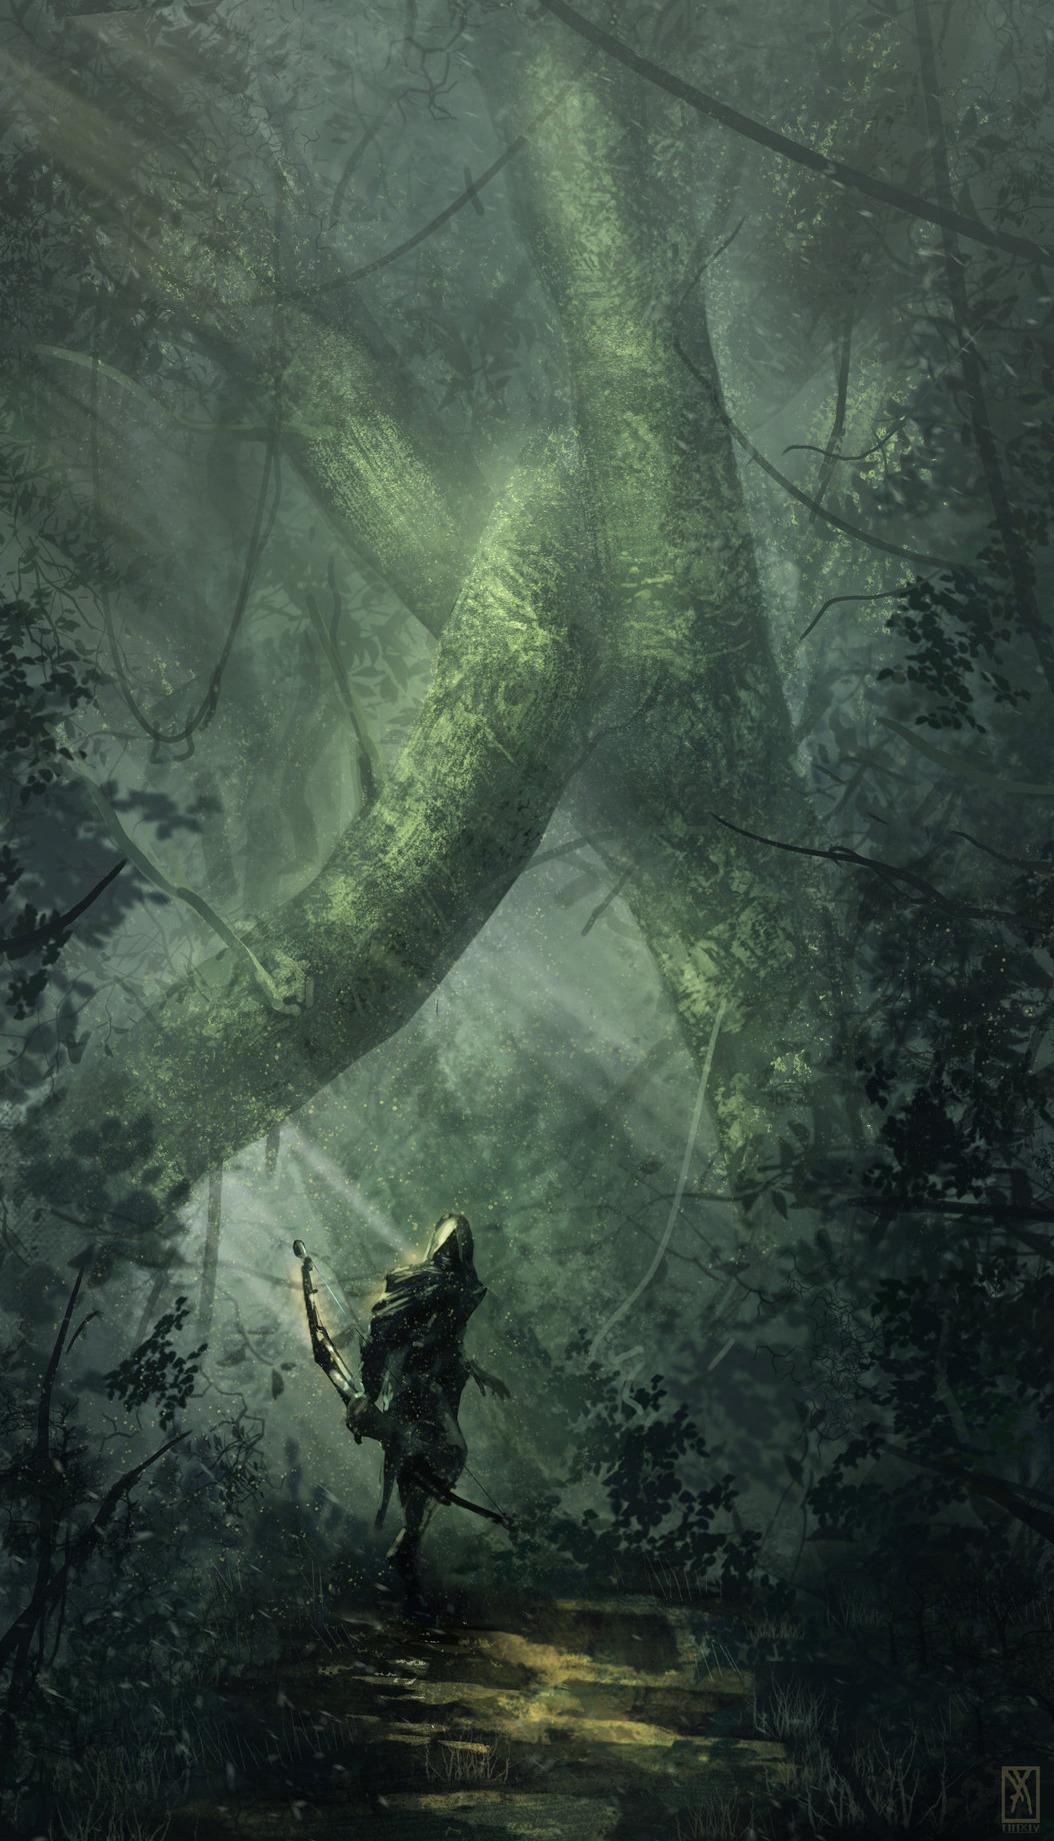 Lord Of The Rings Wallpaper Quotes Art Fantasy Thief Concept Art Digital Art Fantasy Art Epic